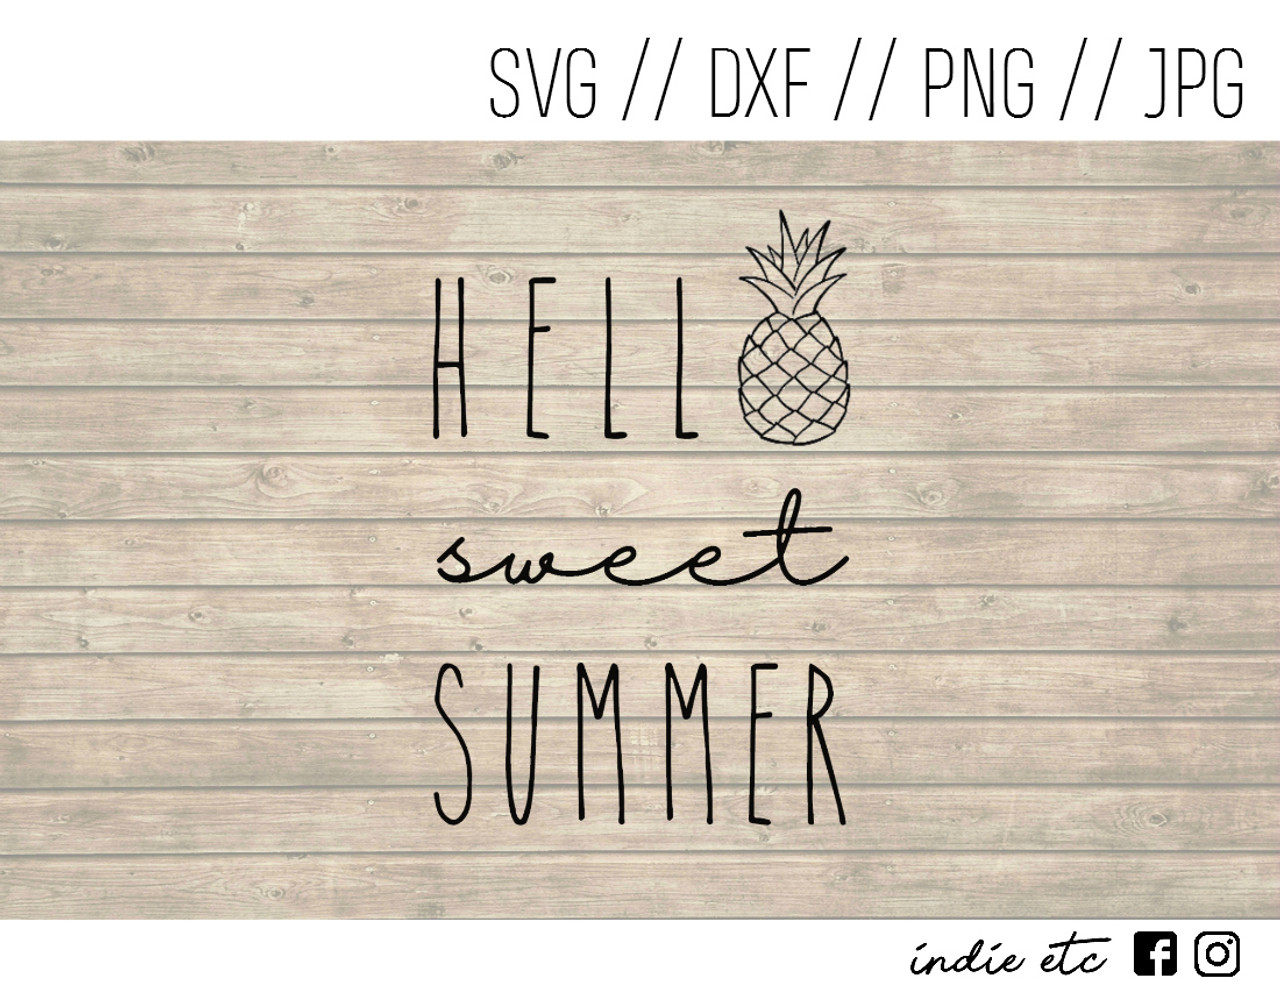 Hello Sweet Summer Digital Art File Svg Dxf Png Jpeg